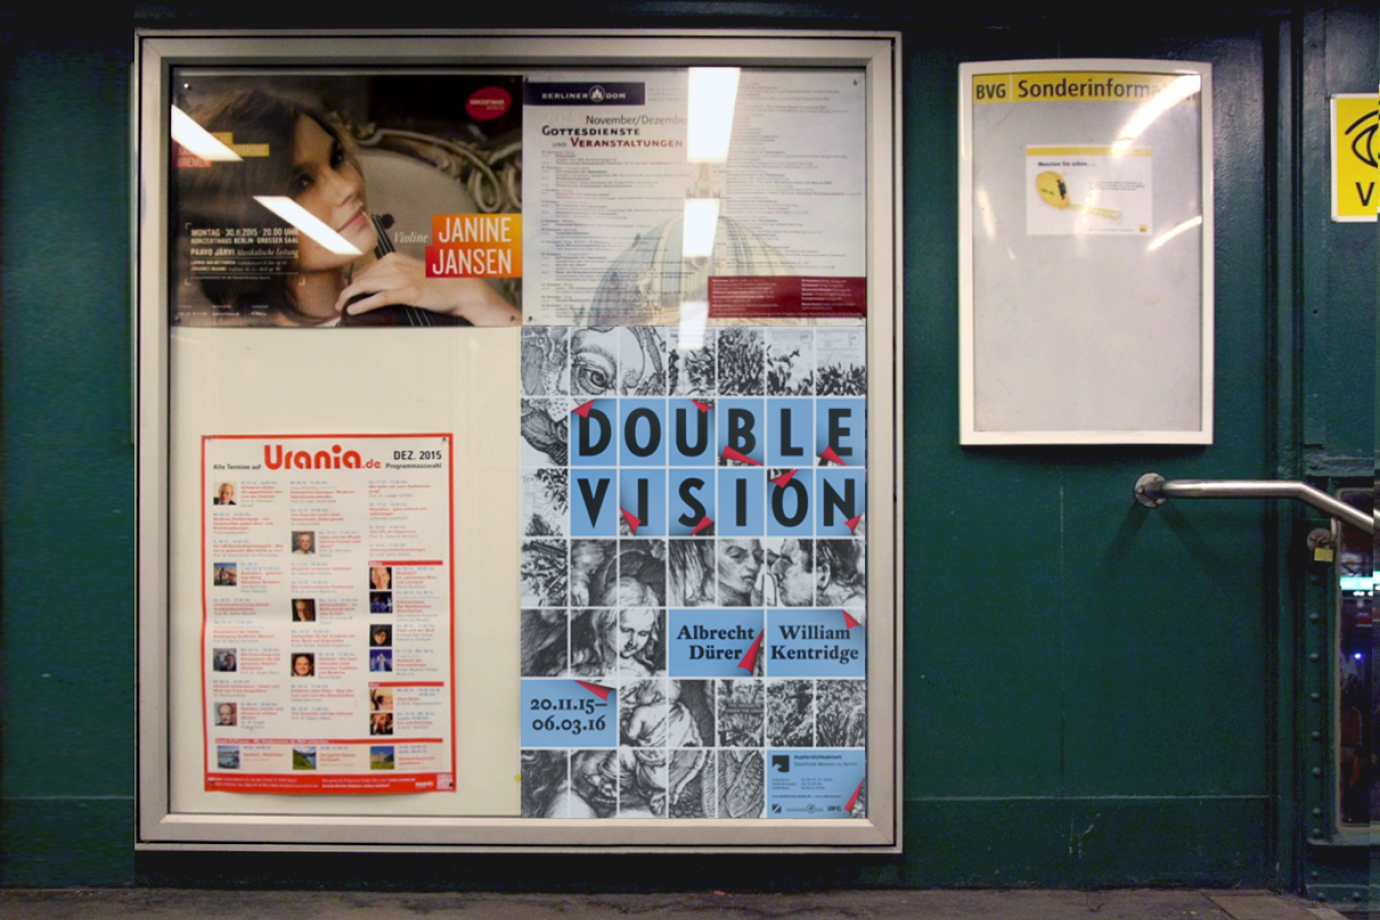 http://e-o-t.de/wordpress/wp-content/uploads/2017/01/2014_eot-DoubleVision-Poster-02.jpg